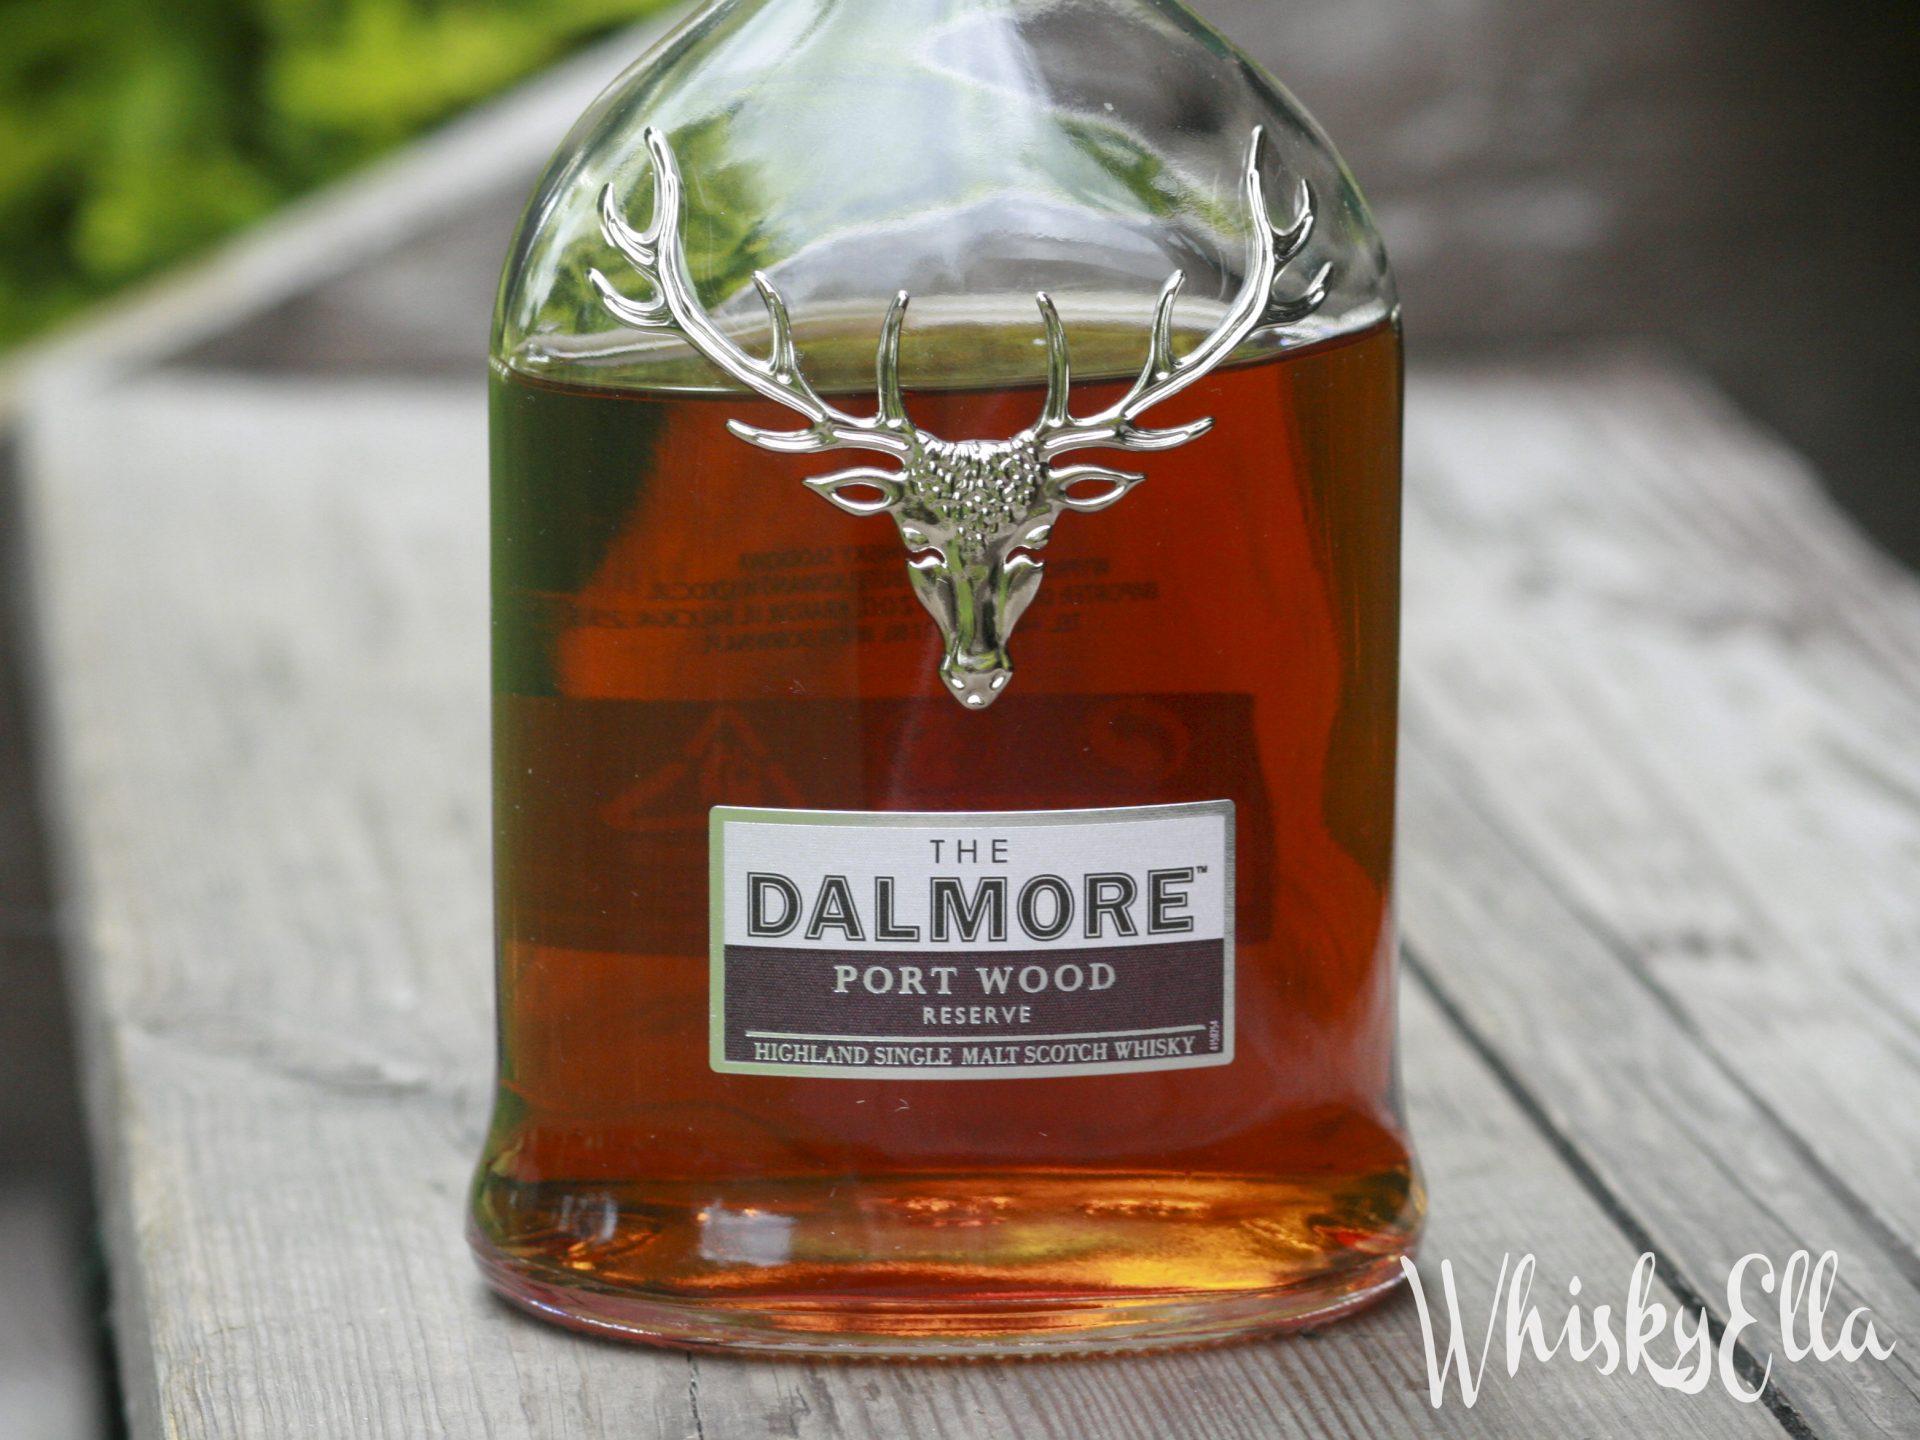 Nasza recenzja Dalmore Port Wood Reserve #110